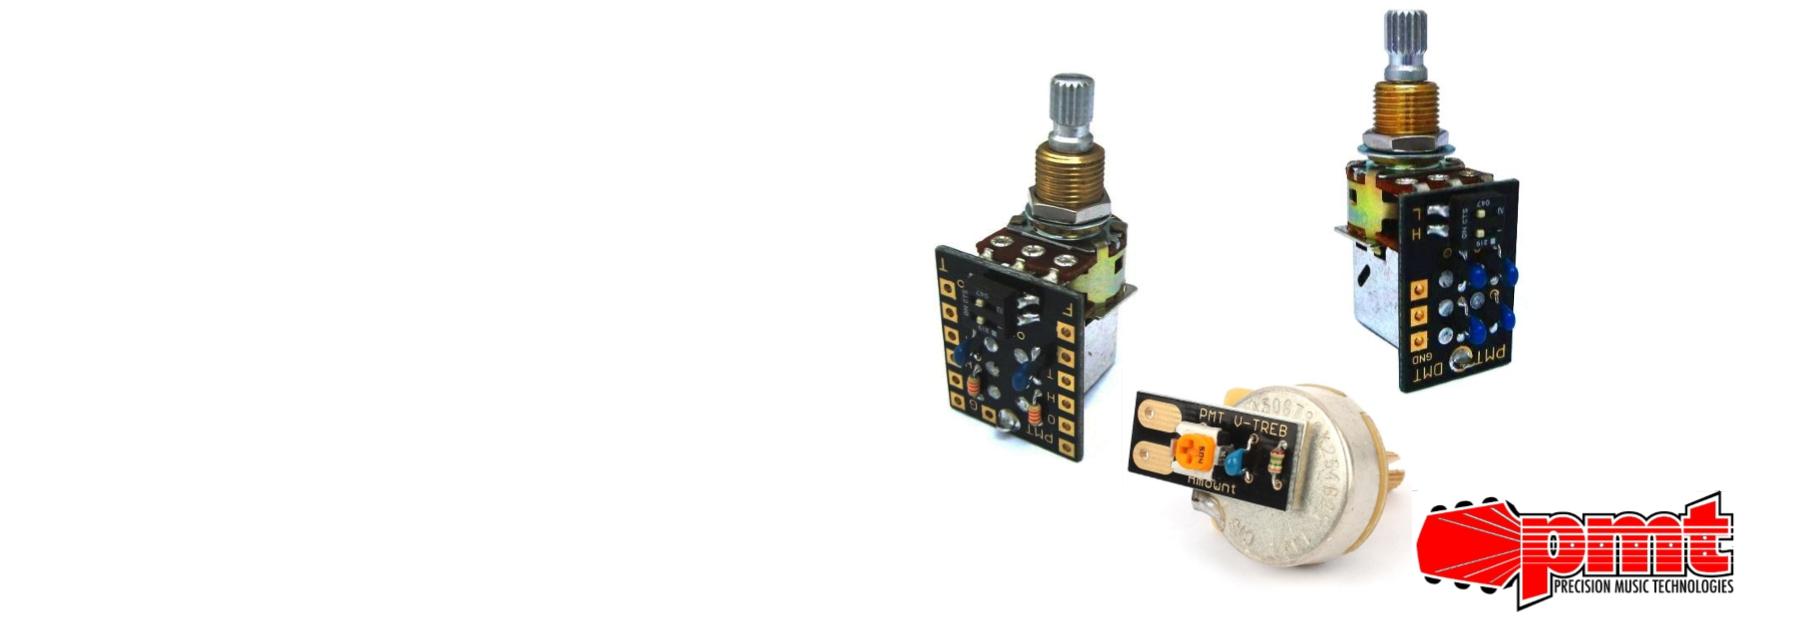 medium resolution of pmt sonic controls